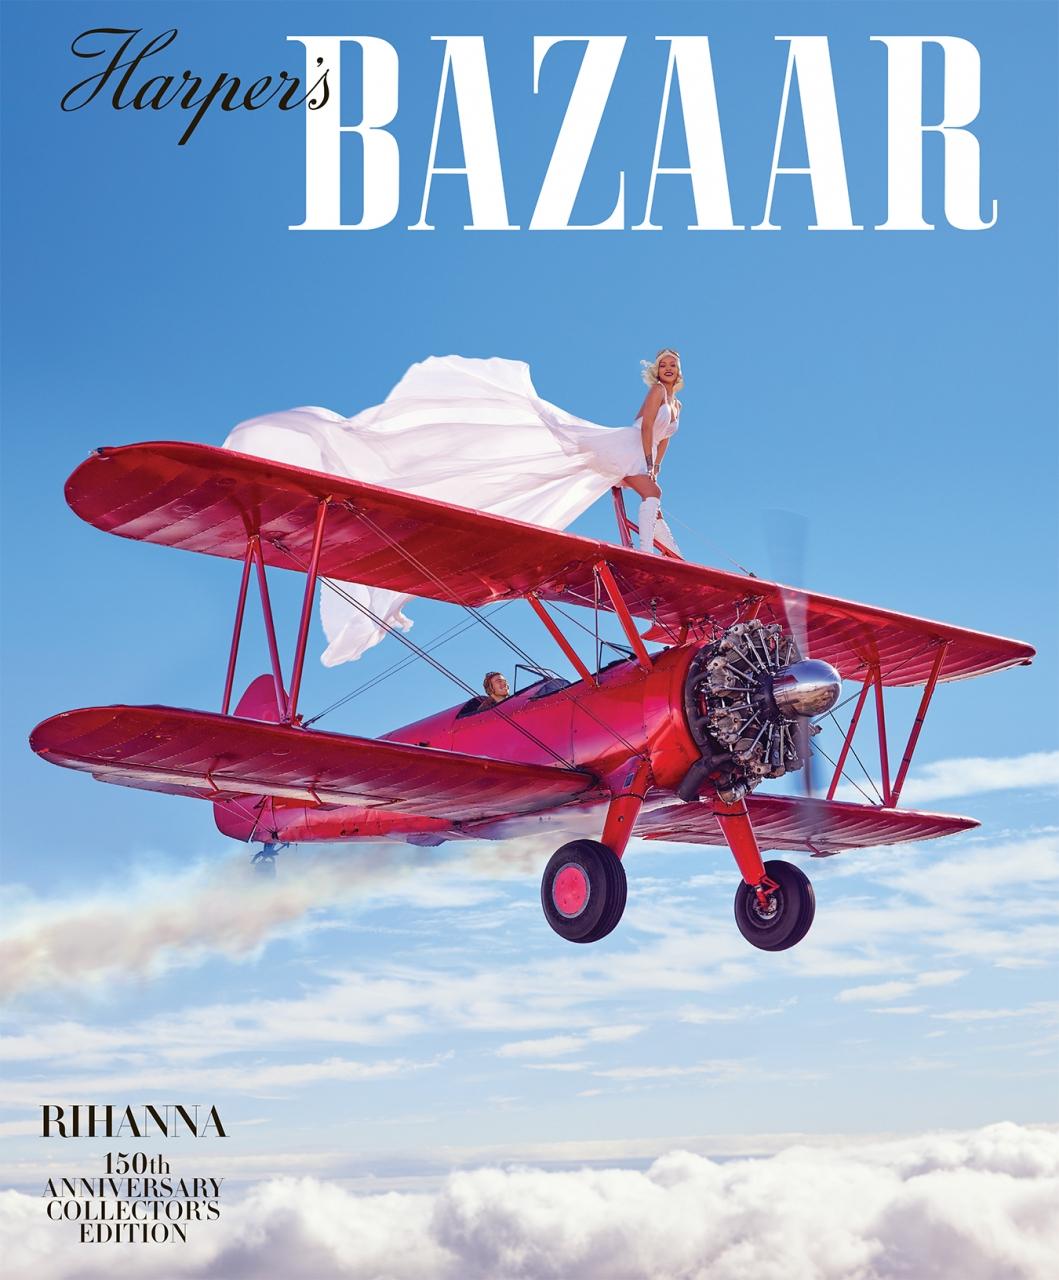 Rihanna by Mariano Vivanco for Harper's Bazaar, March 2017